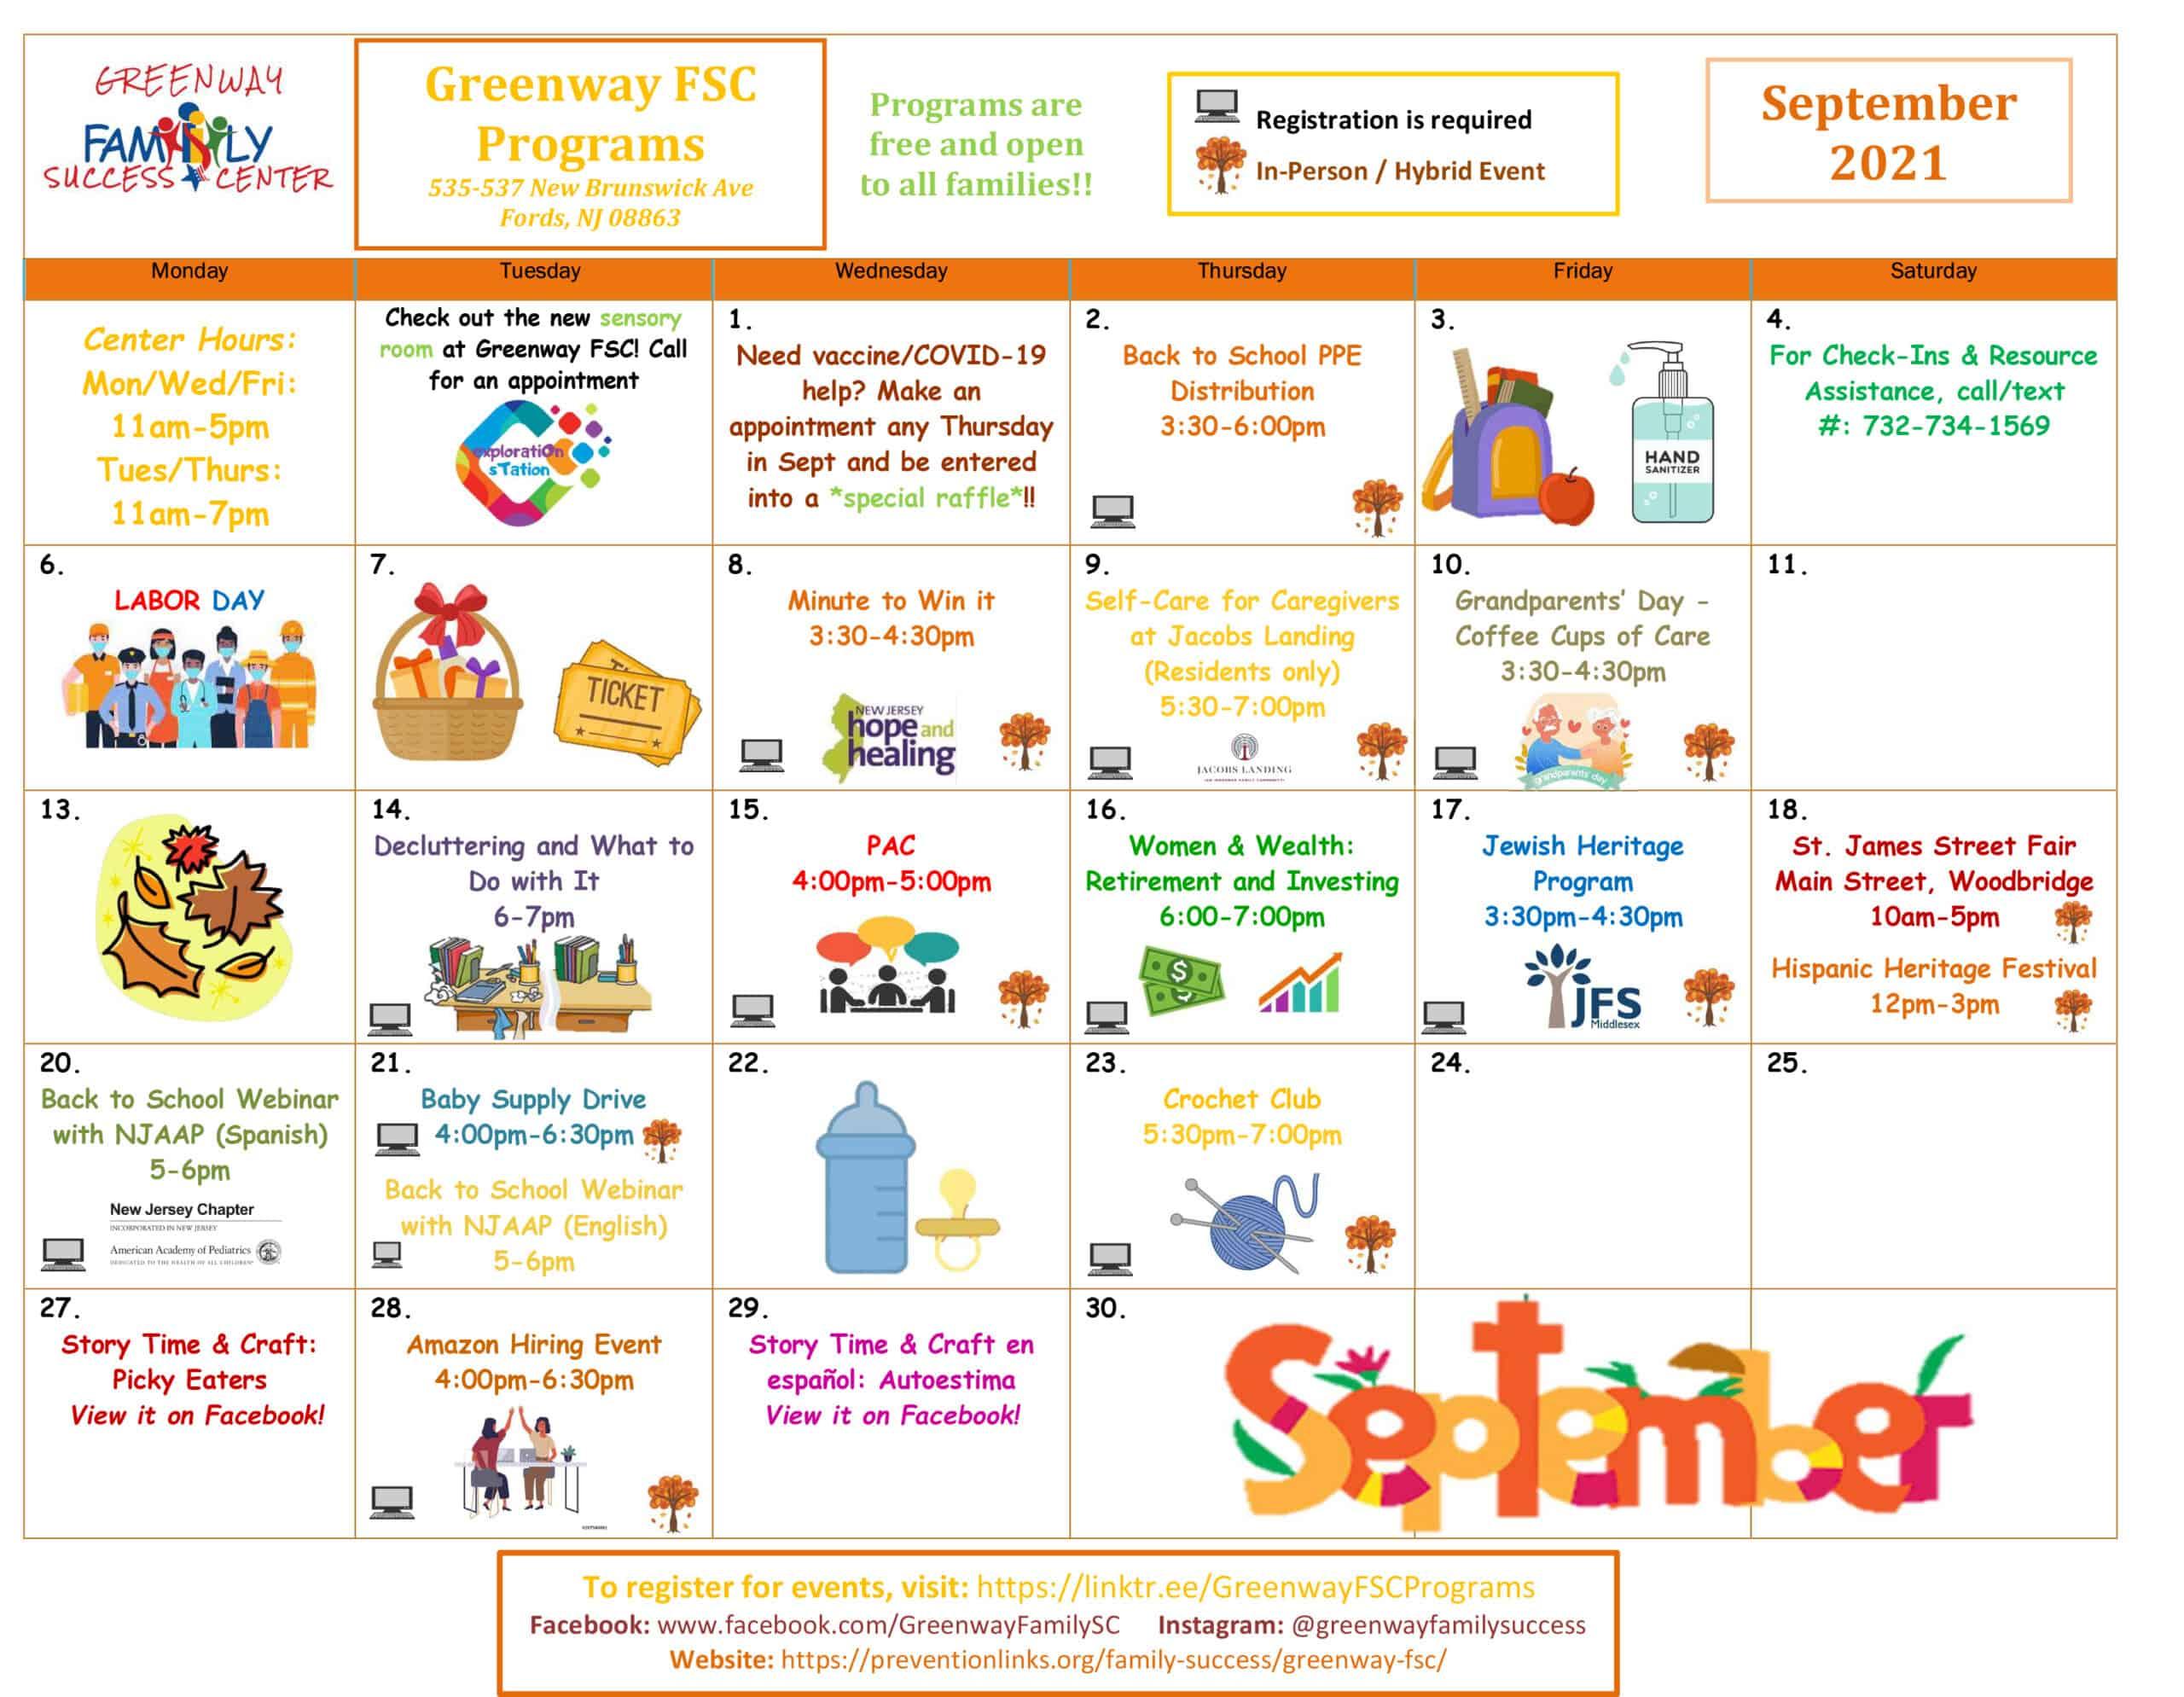 Microsoft Word - Greenway September 2021 Programs